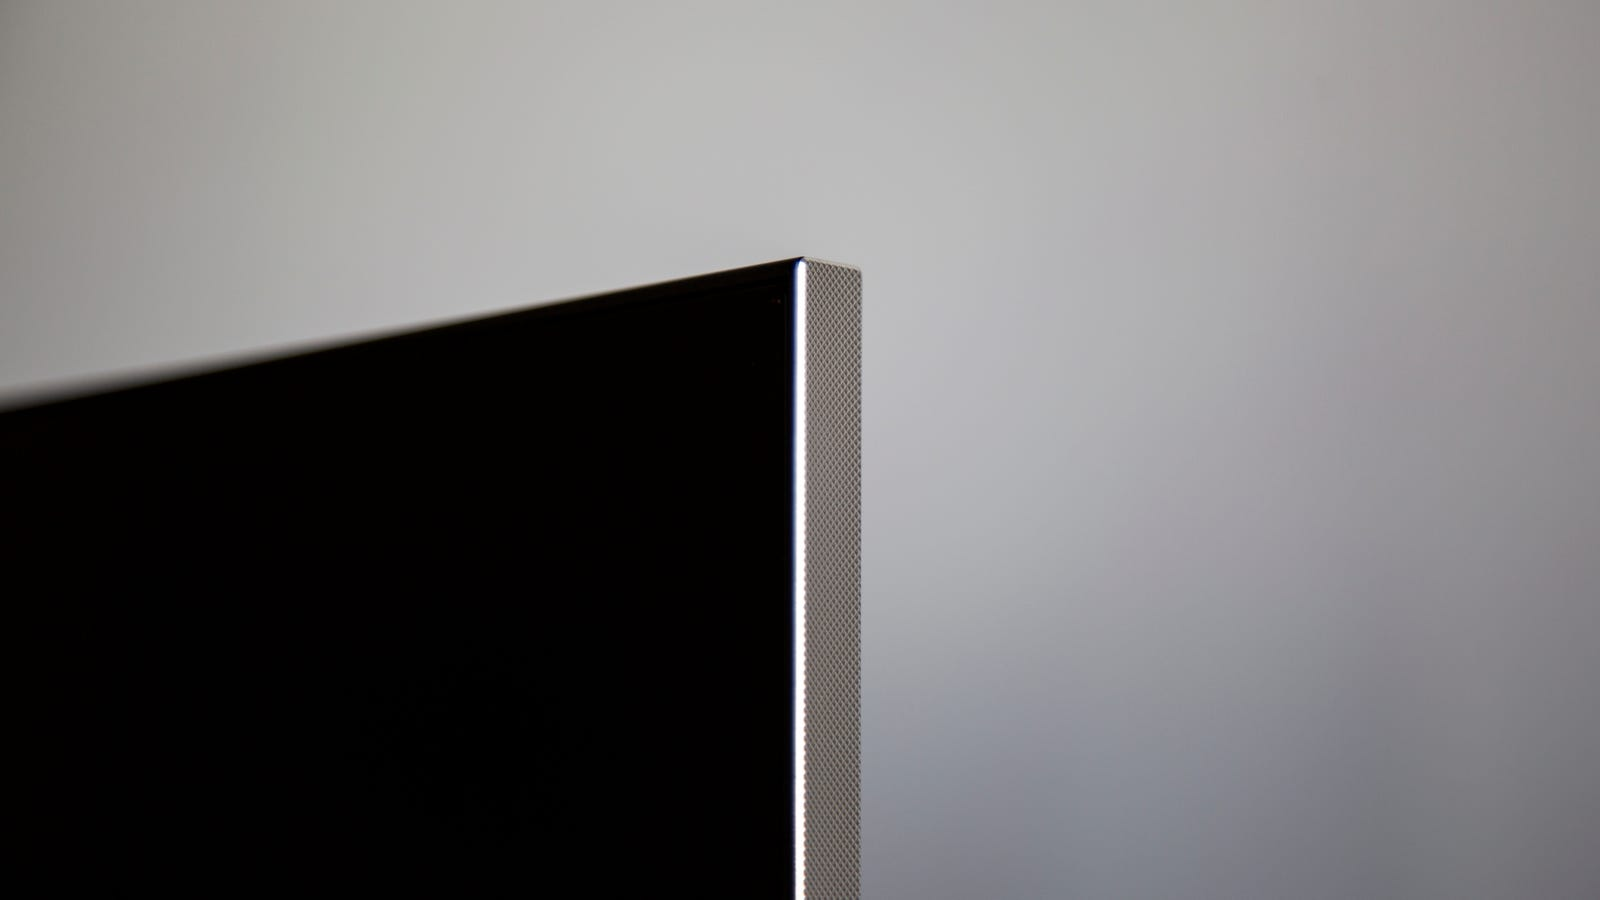 The textured aluminum edge provide a nice frame.